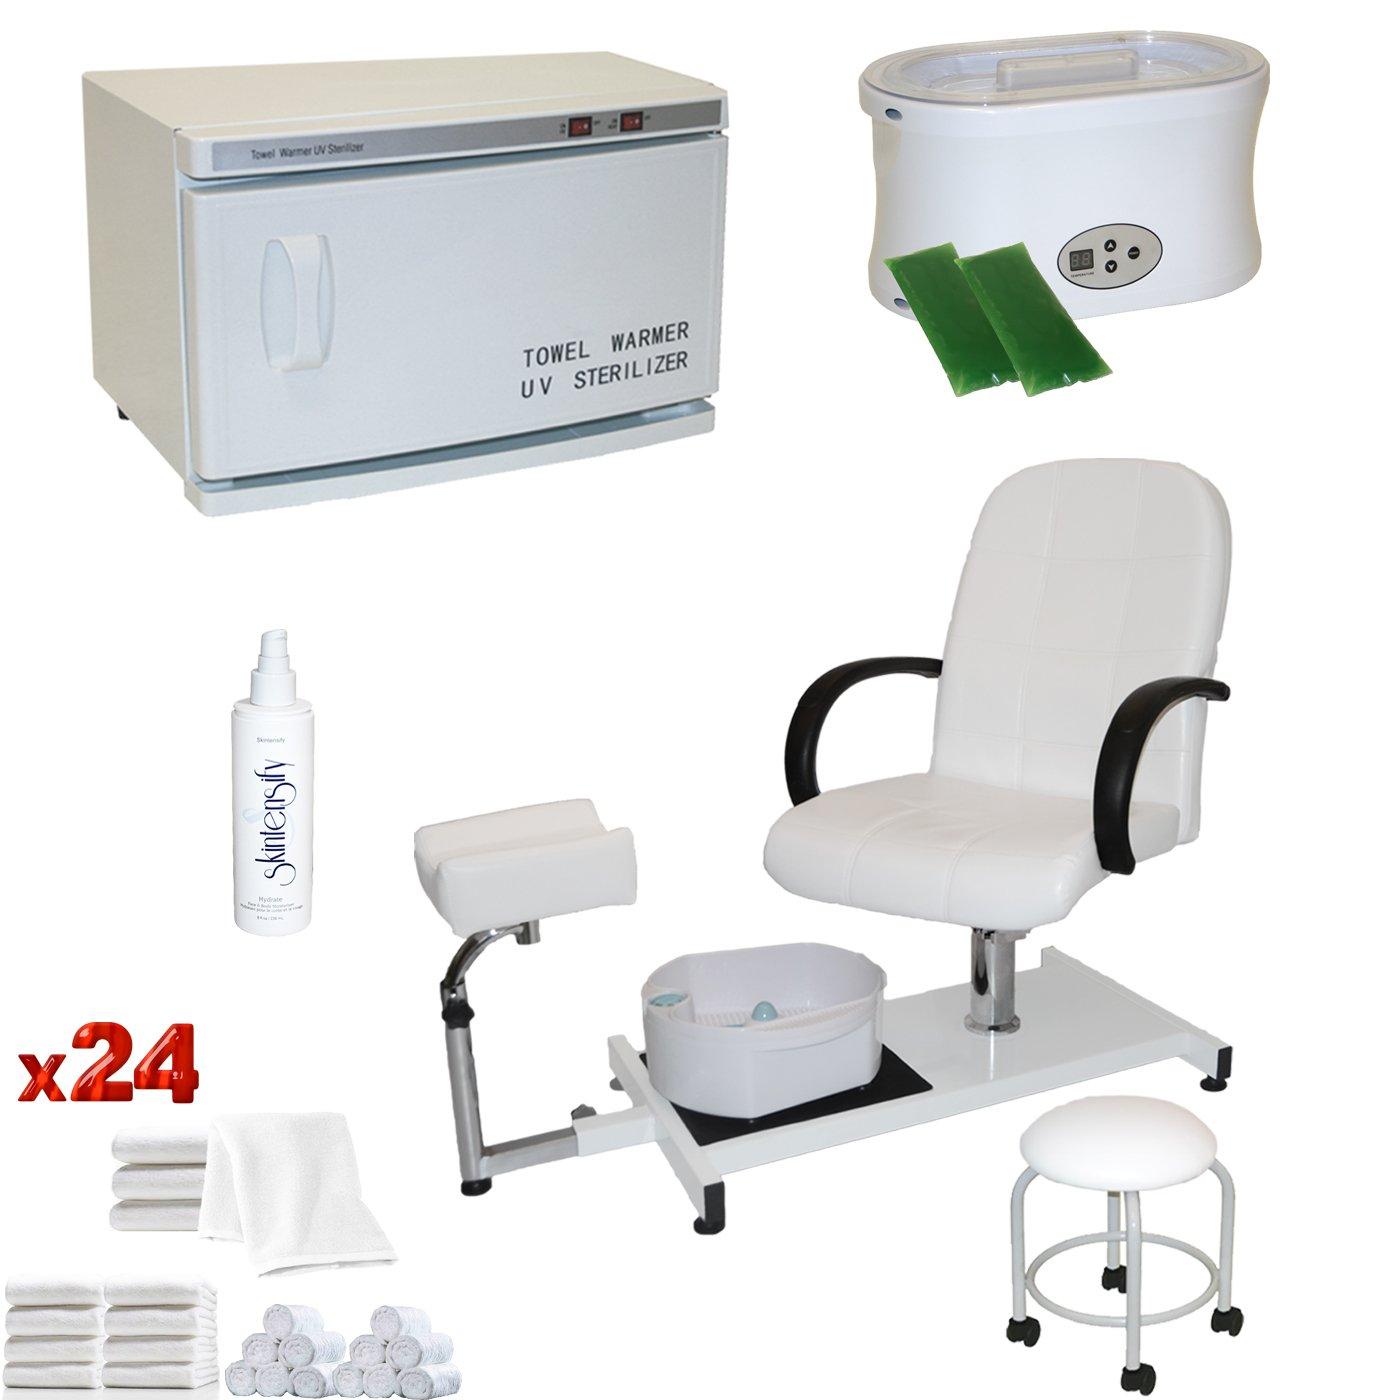 LCL Beauty White Pedicure Chair Hot Towel Warmer & Sterilizer Paraffin Wax Warmer Package